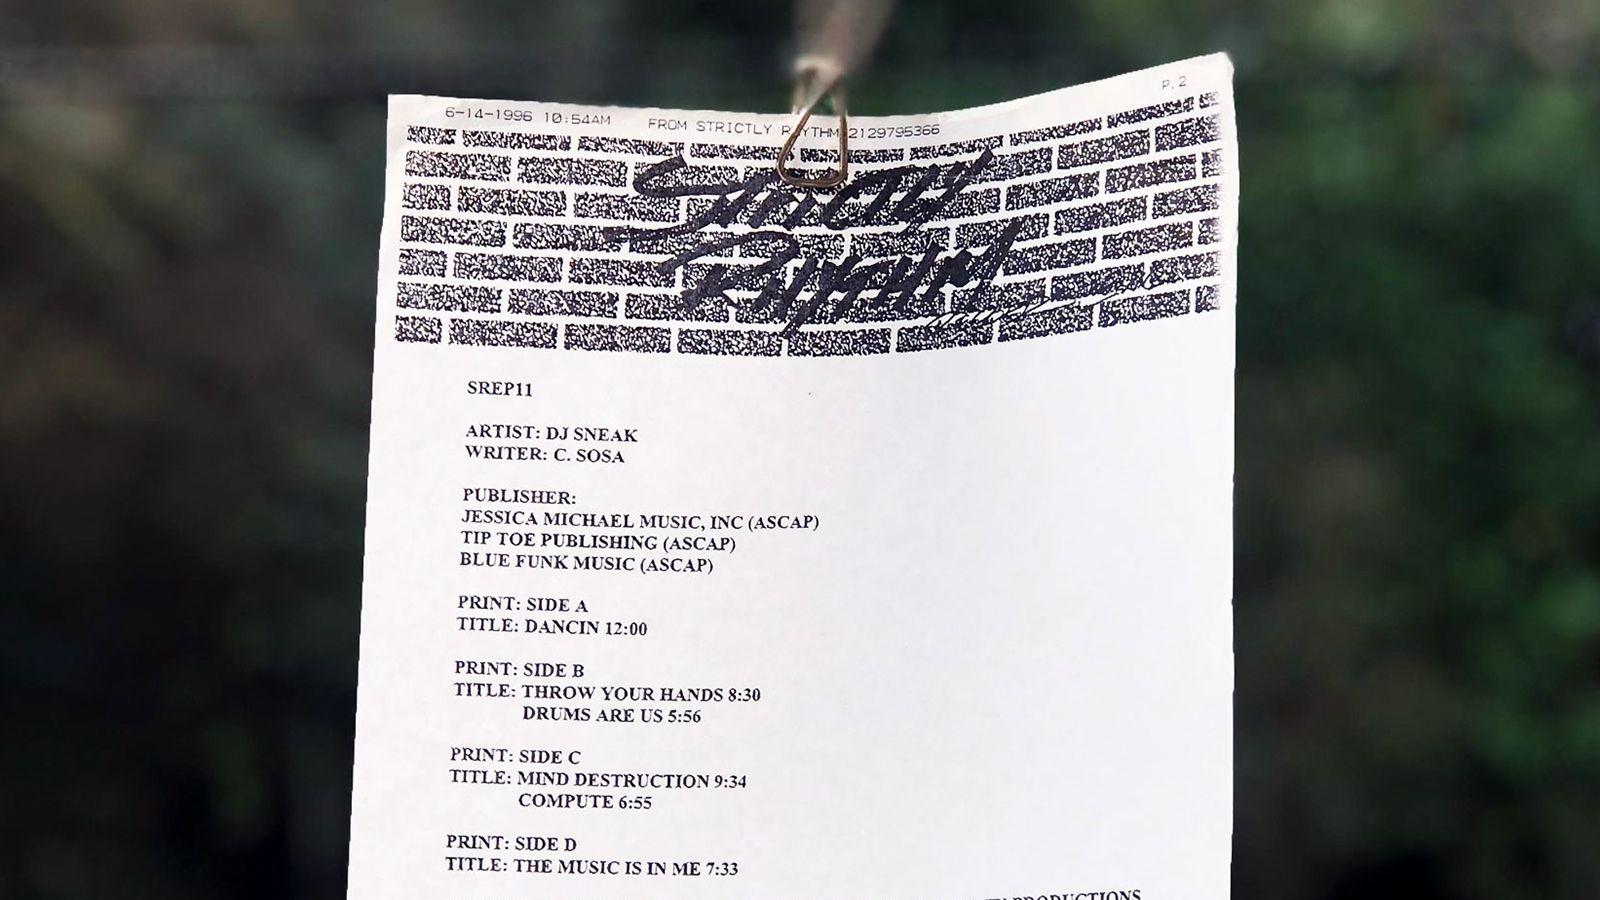 DJ Sneak Dancing Promo Sheet on Strictly Rhythm Records